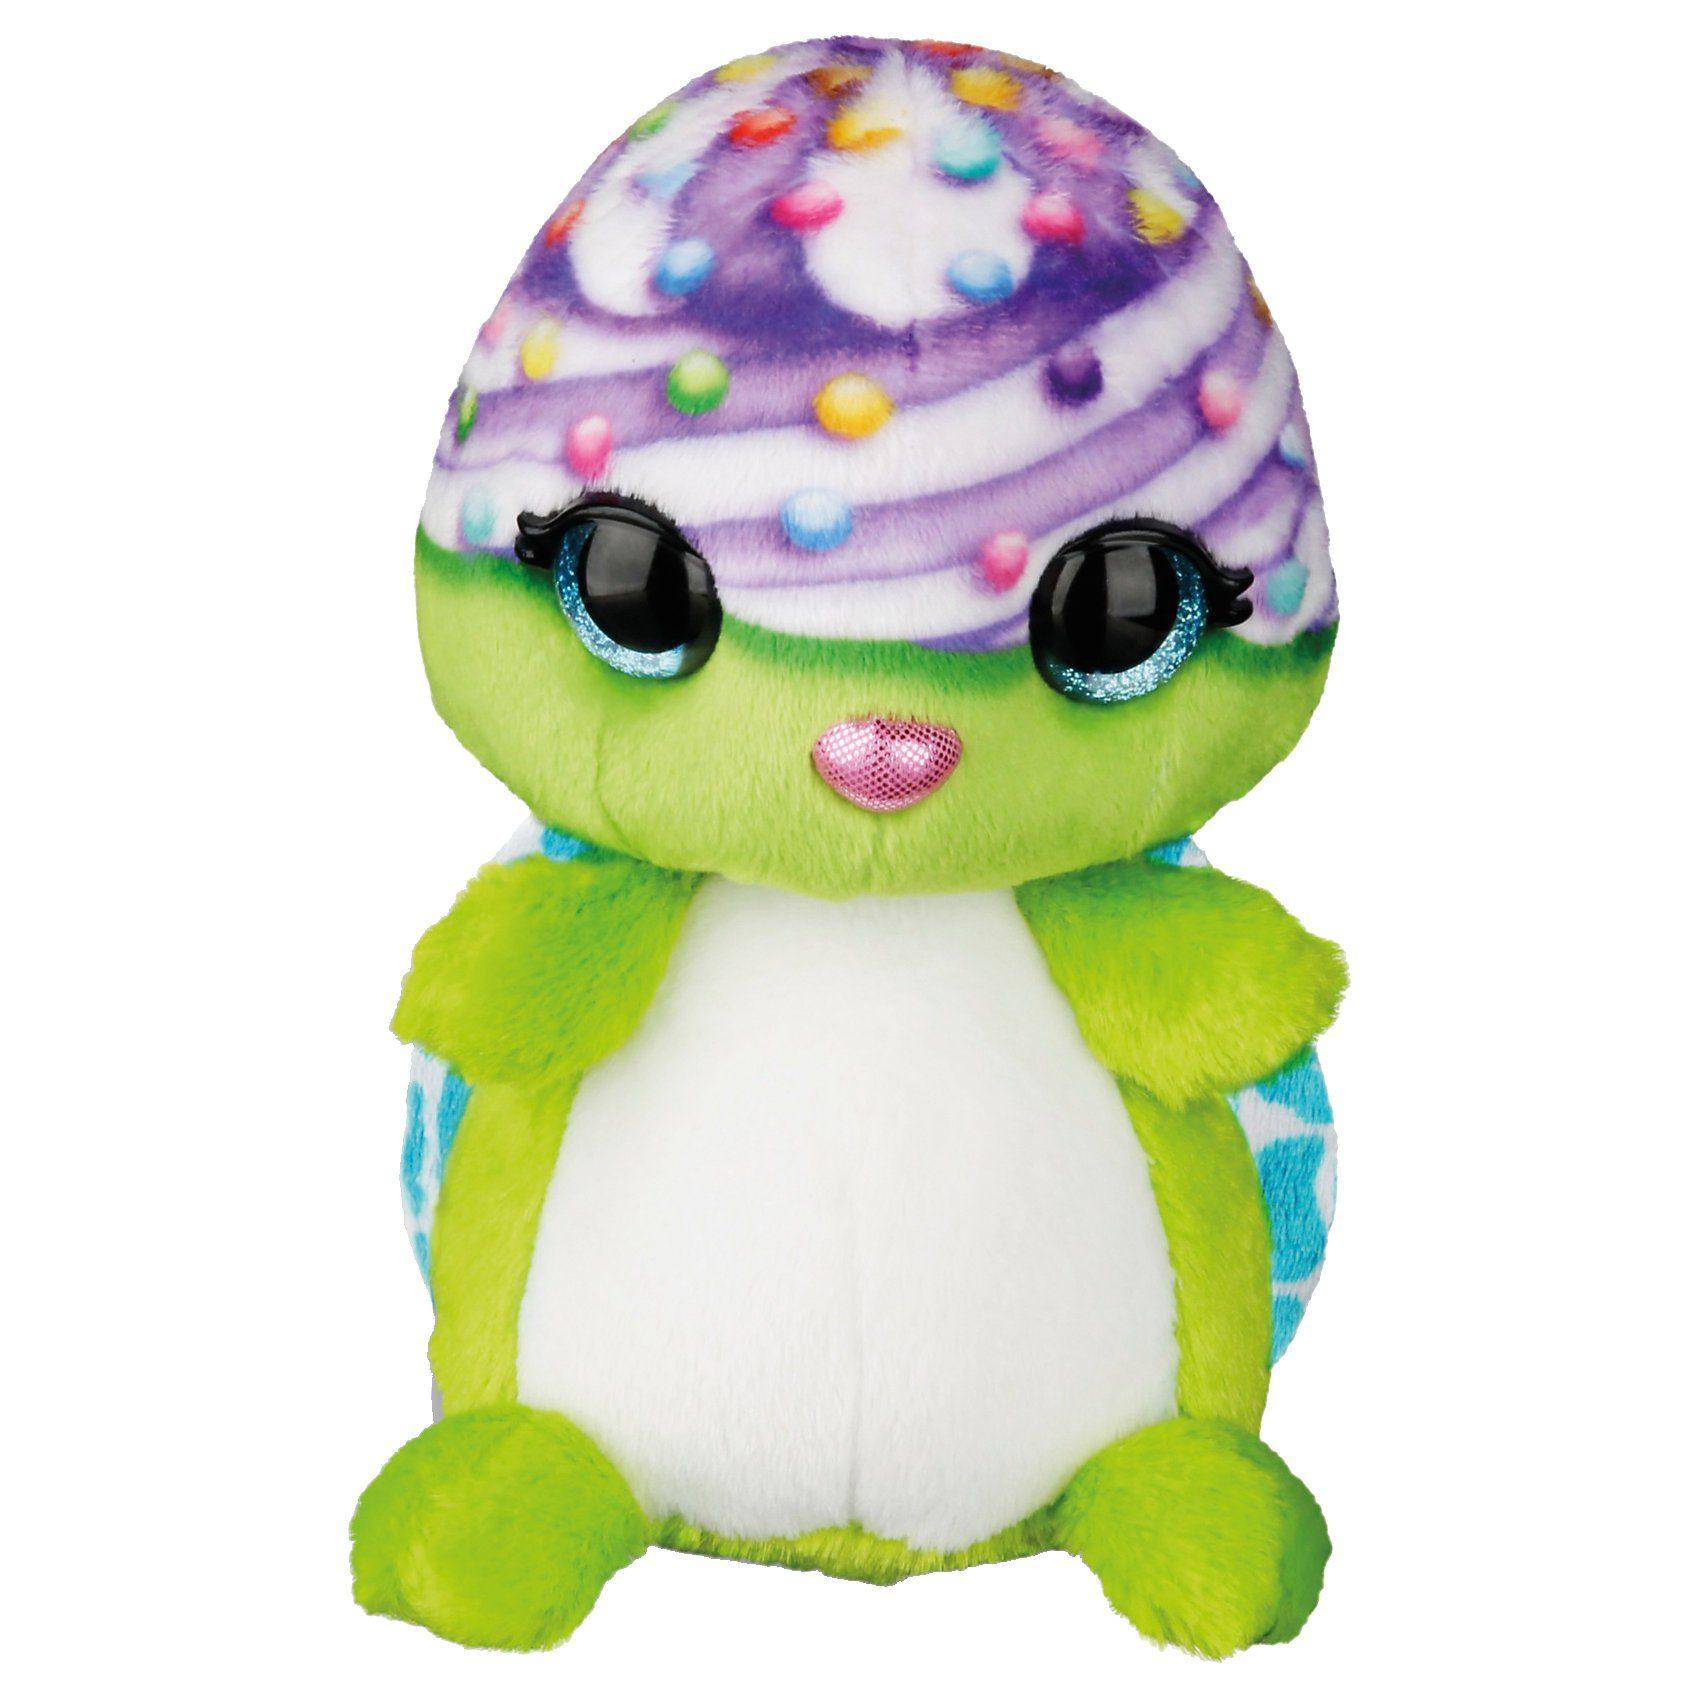 Candy Schildkröte Chocnana doos, 12cm (41834)